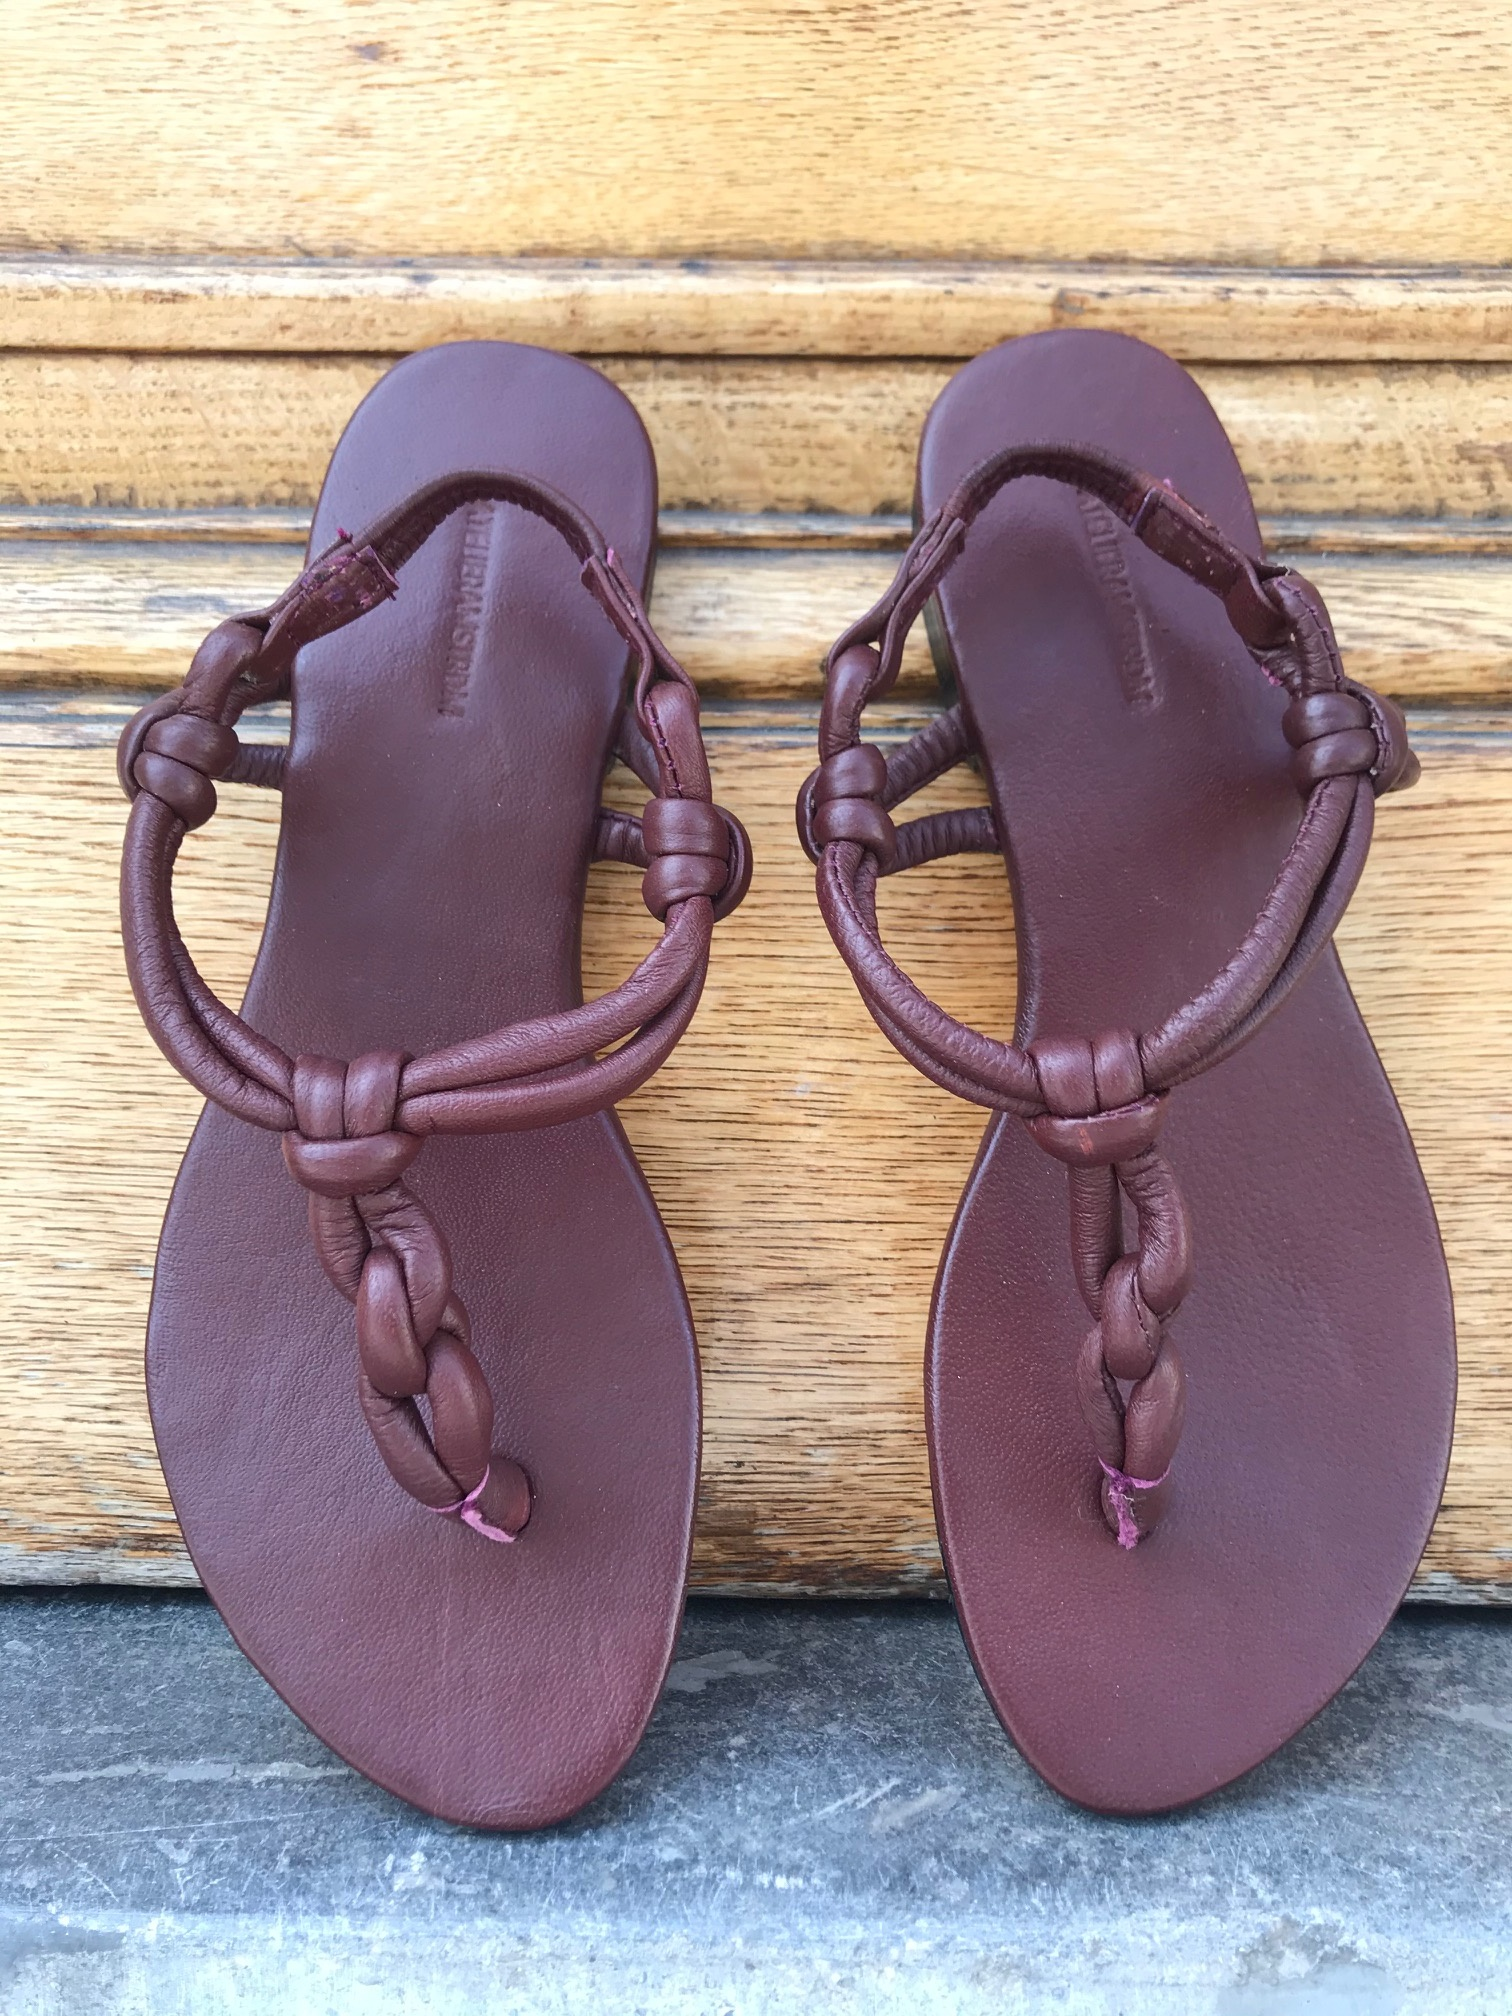 ATELIERAMSTRDM Knot Sandal 39